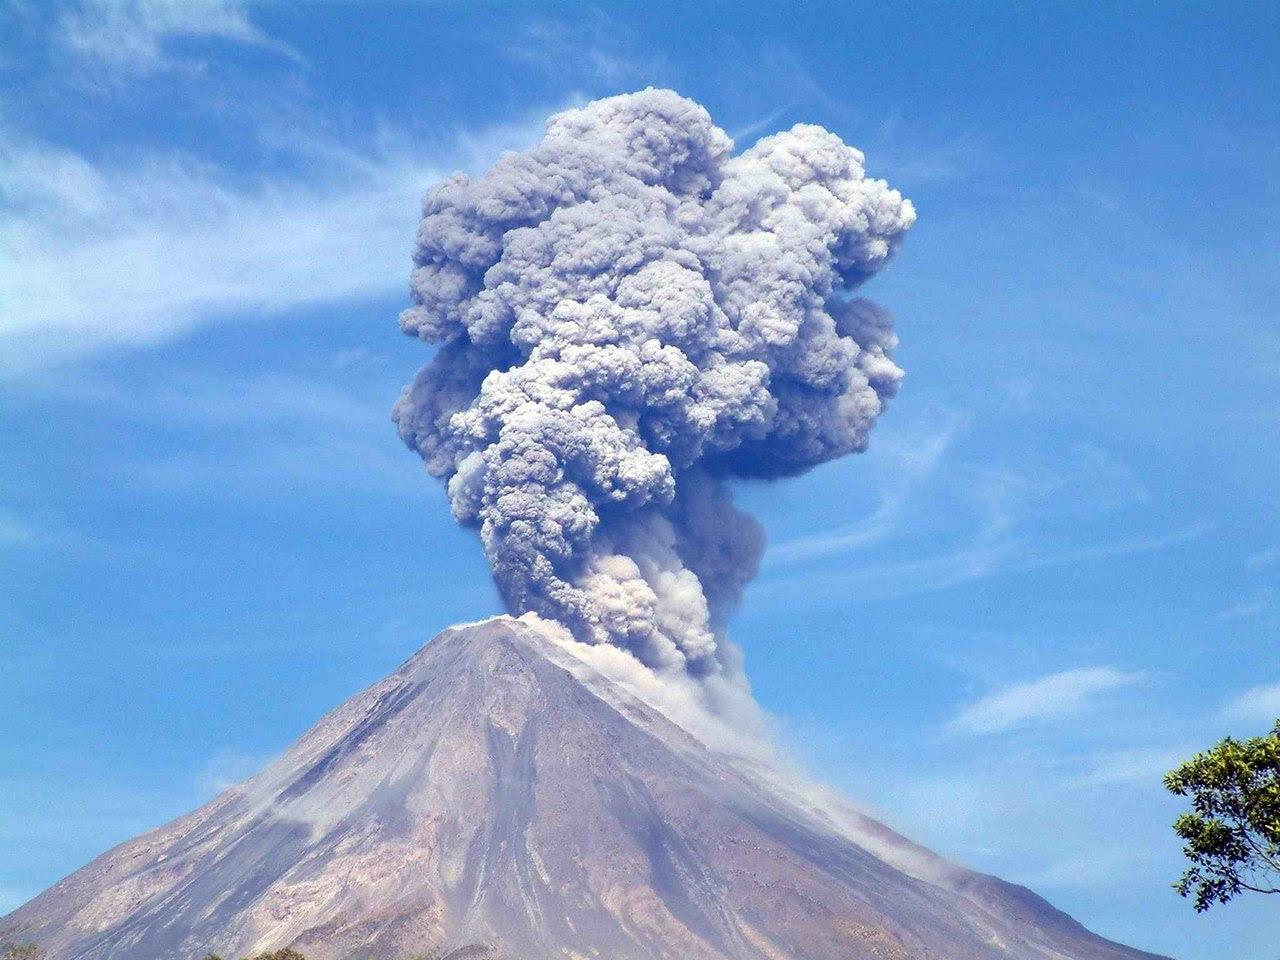 volcanic eruption, volcanic eruption january 2017, volcanic eruption video, volcanic eruption january 2017 video